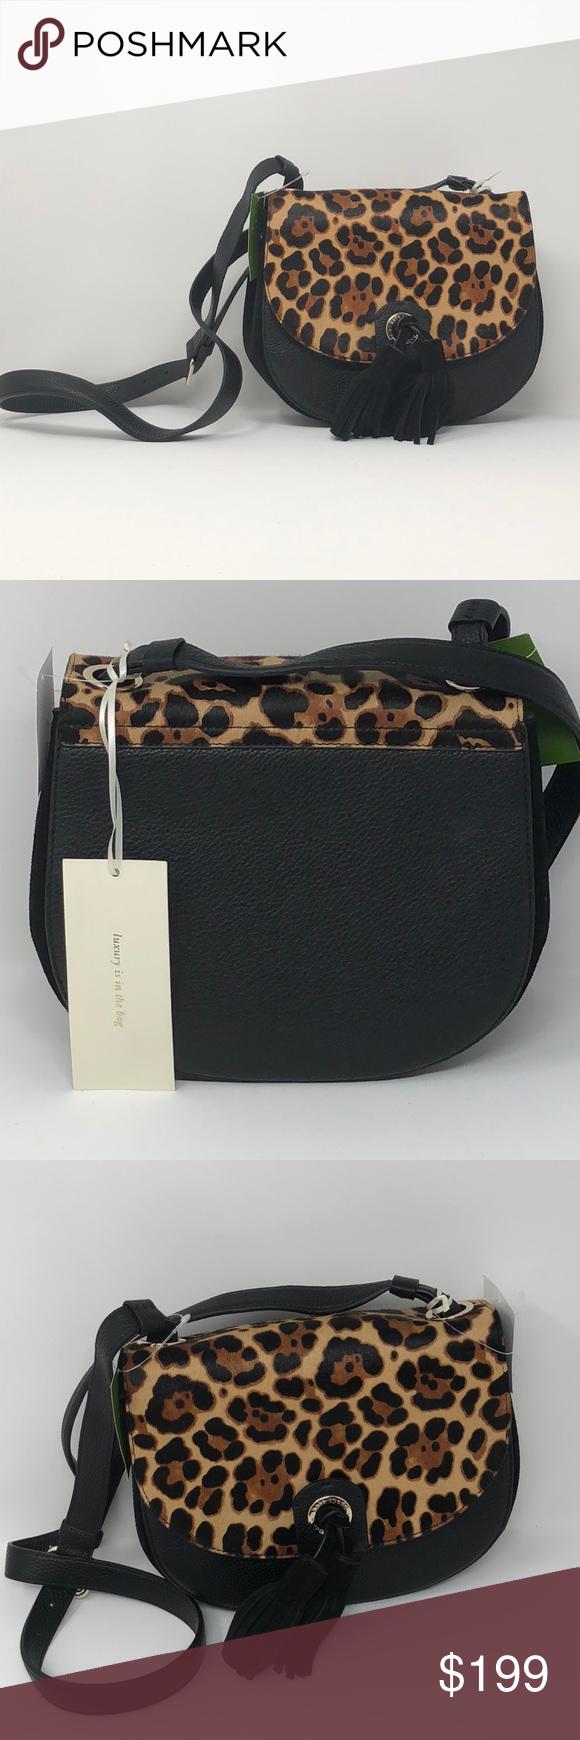 cdcb06c550 NWT Kate Spade crossbody Bag Kate Spade Sequoia Avenue Small Andi Crossbody  Handbag Black leather bag